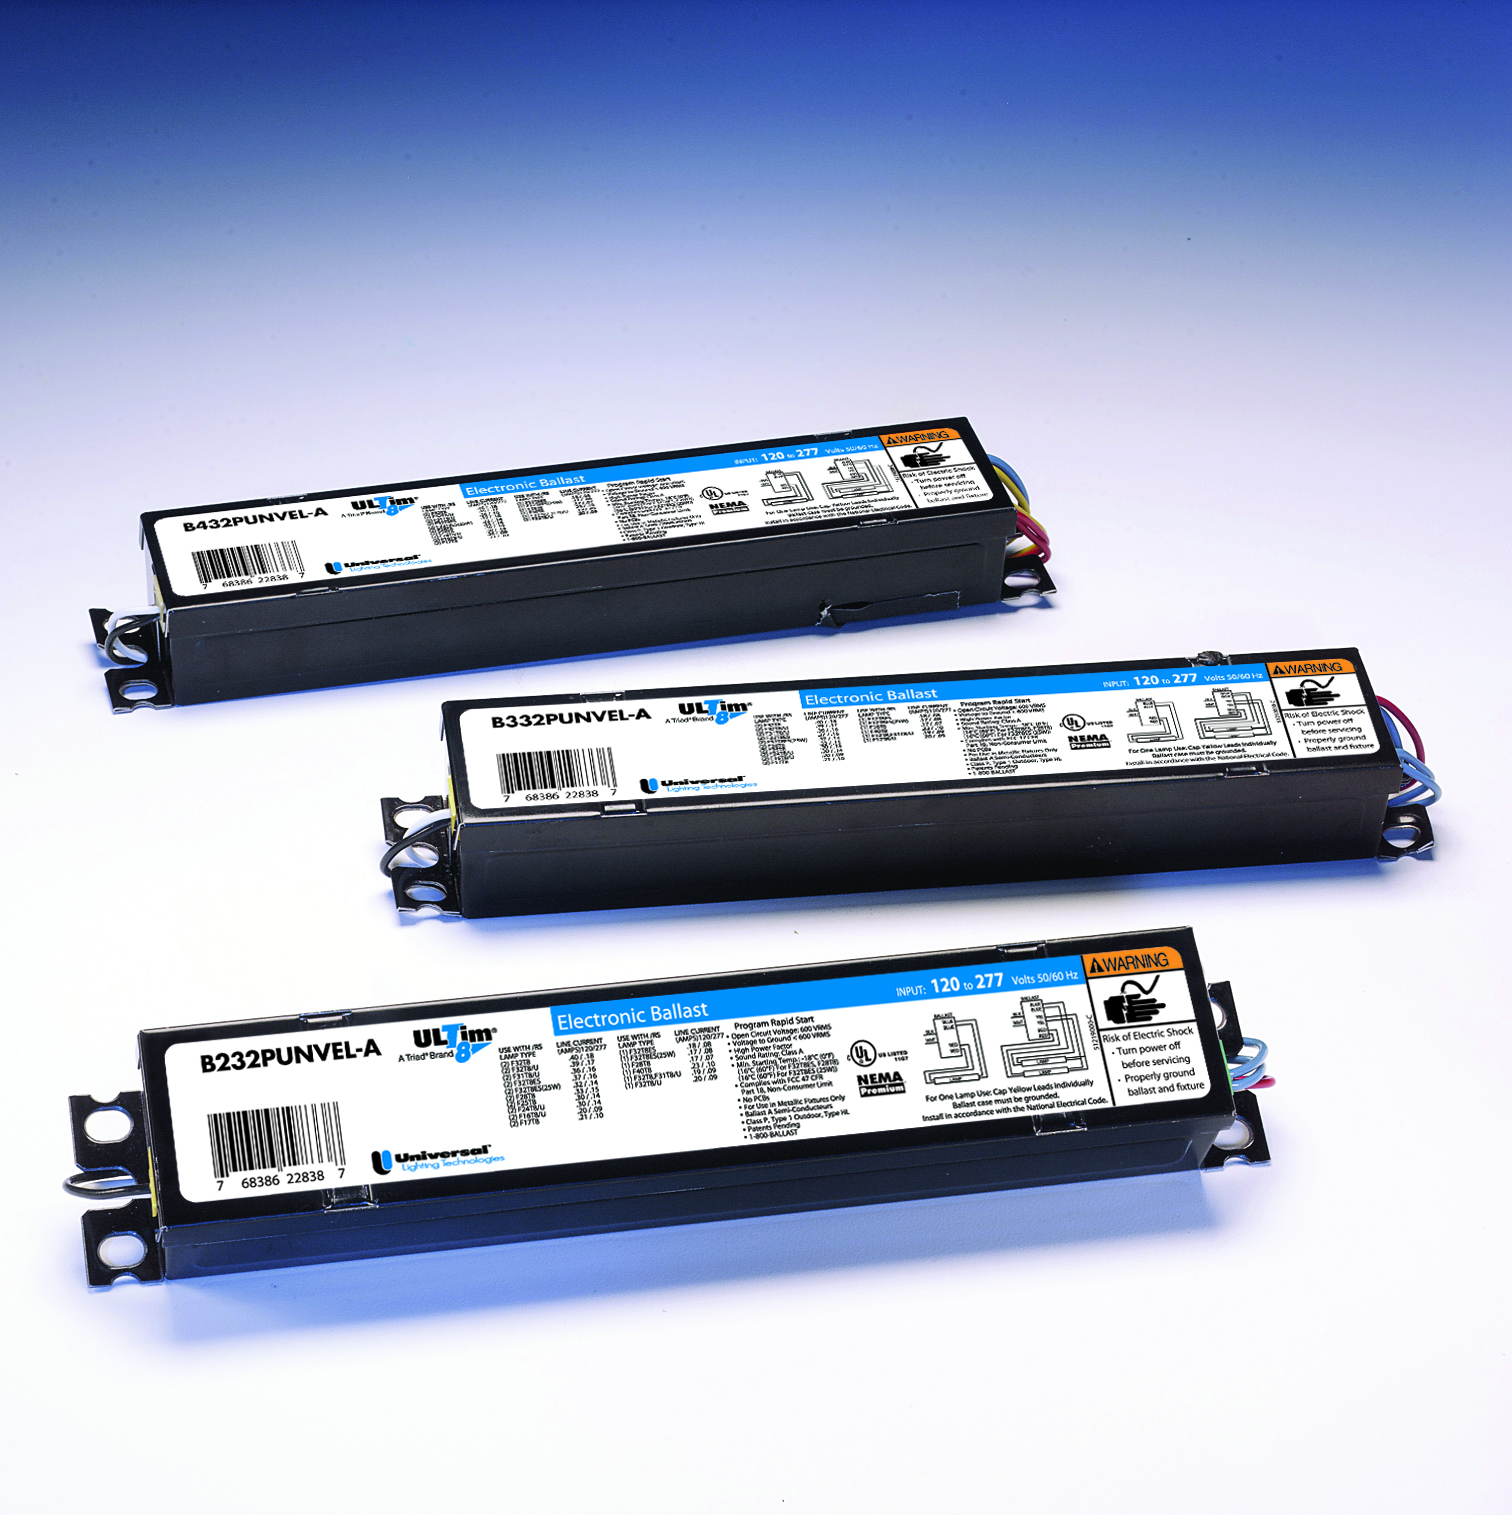 Universal Lighting Technologies B260I120M-A000I UNIVERSAL LIGHTING TECH B260I120MA000I